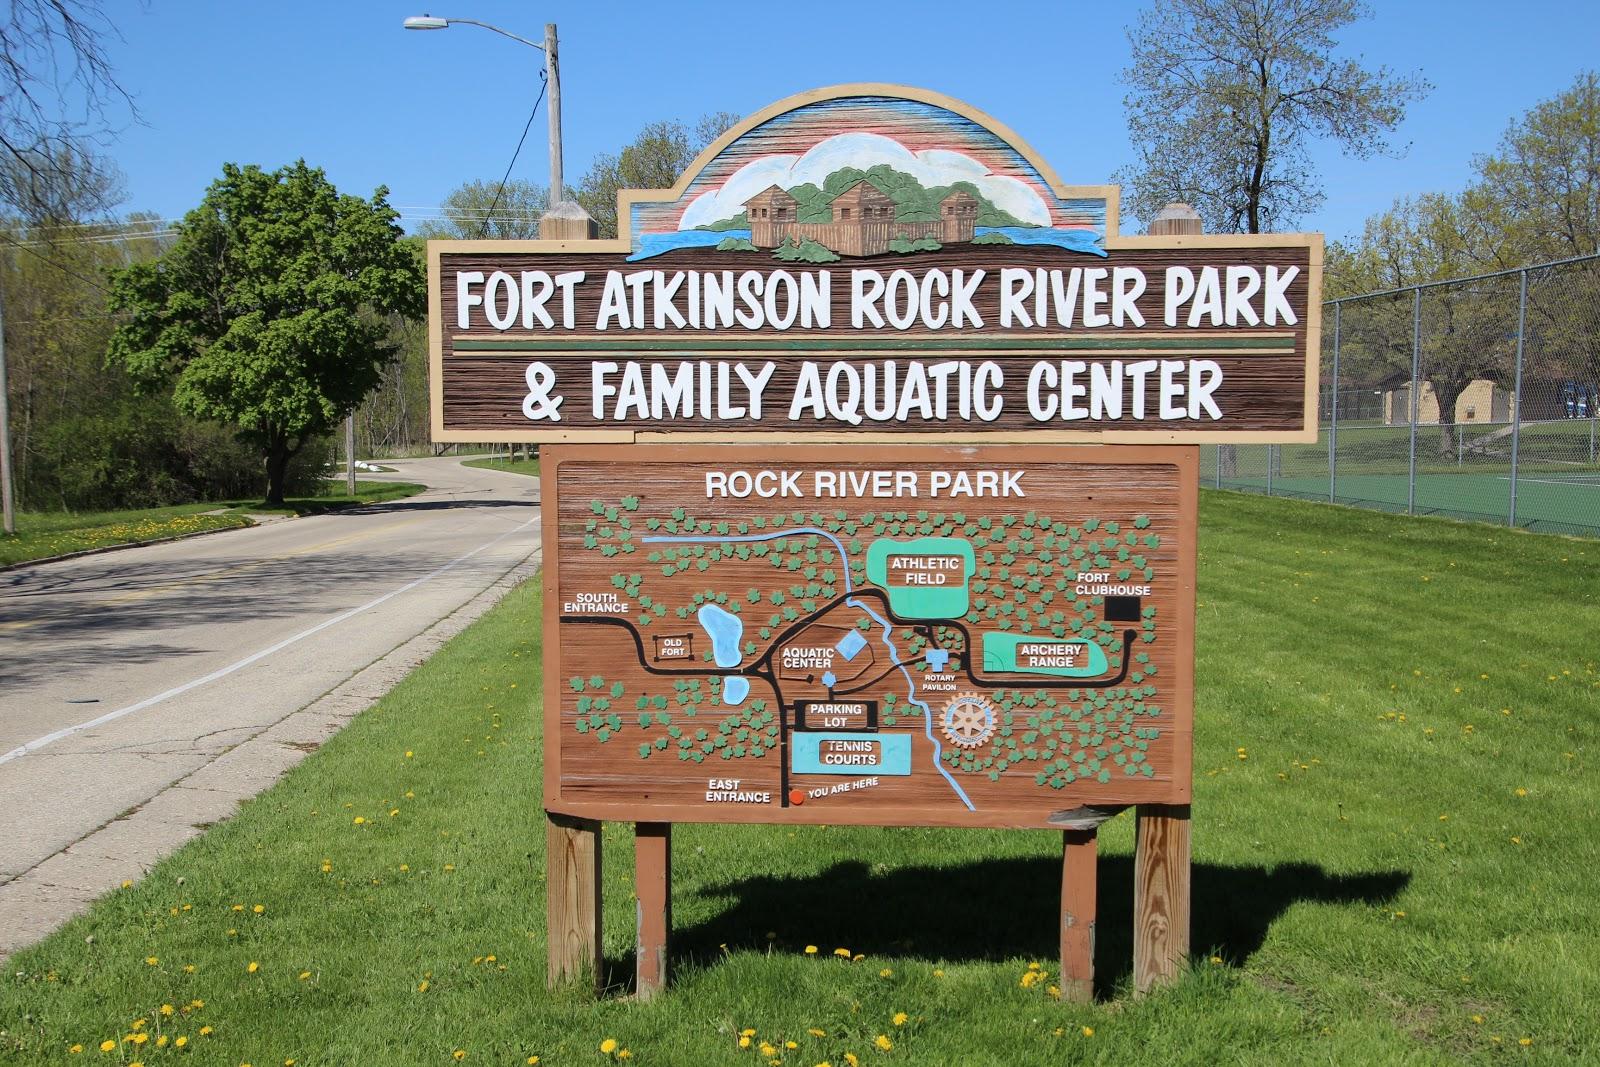 Fort Aquatic Center.JPG